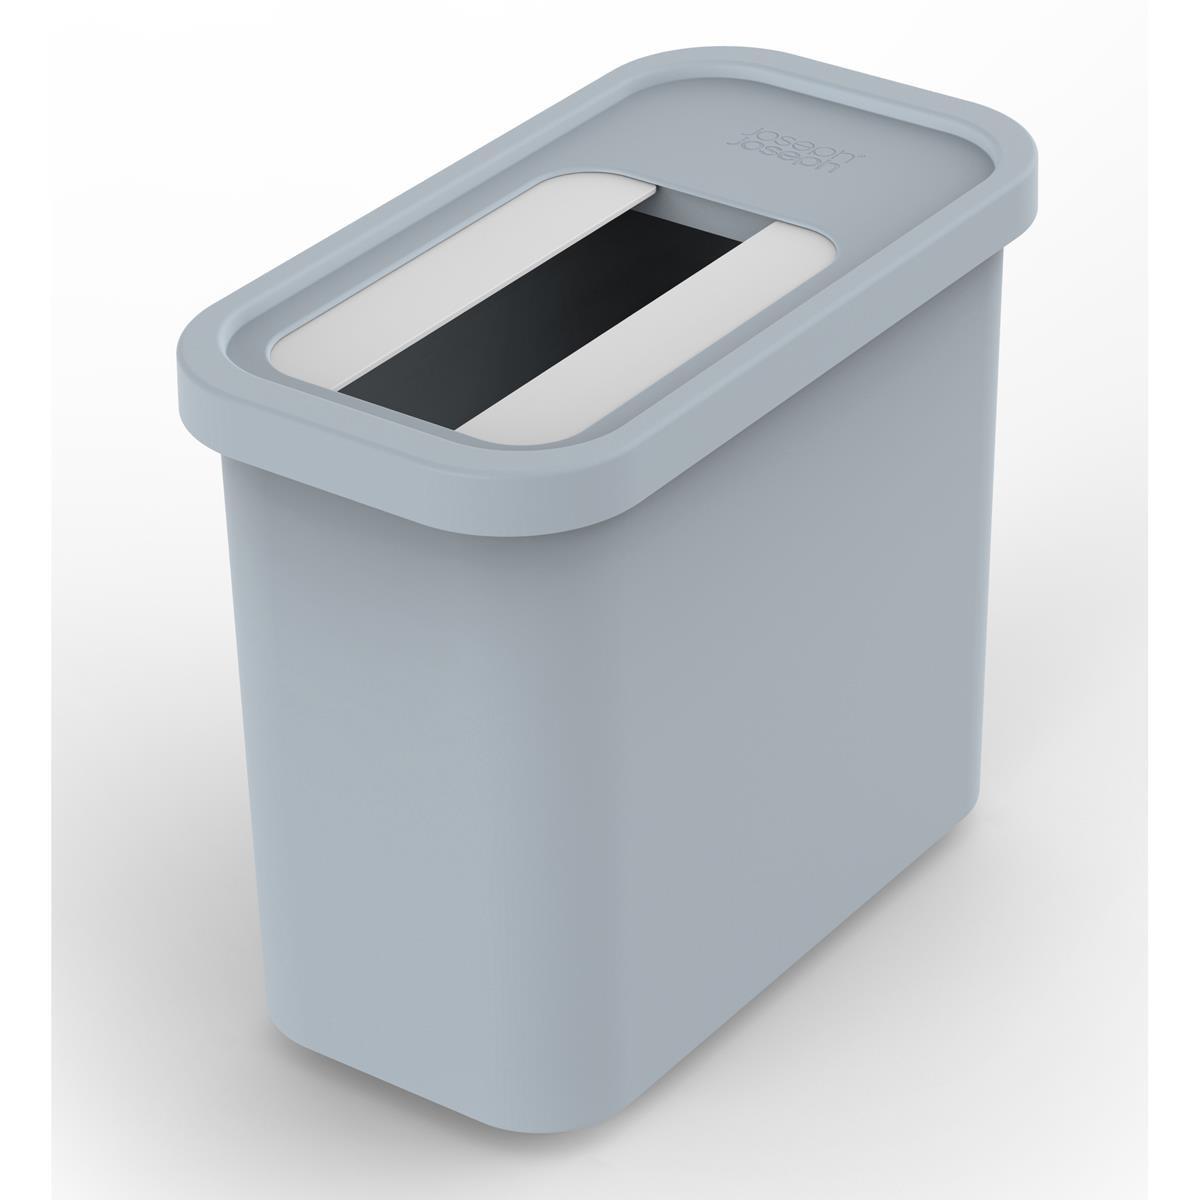 Joseph Joseph GoRecycle 32L Recycling Collector